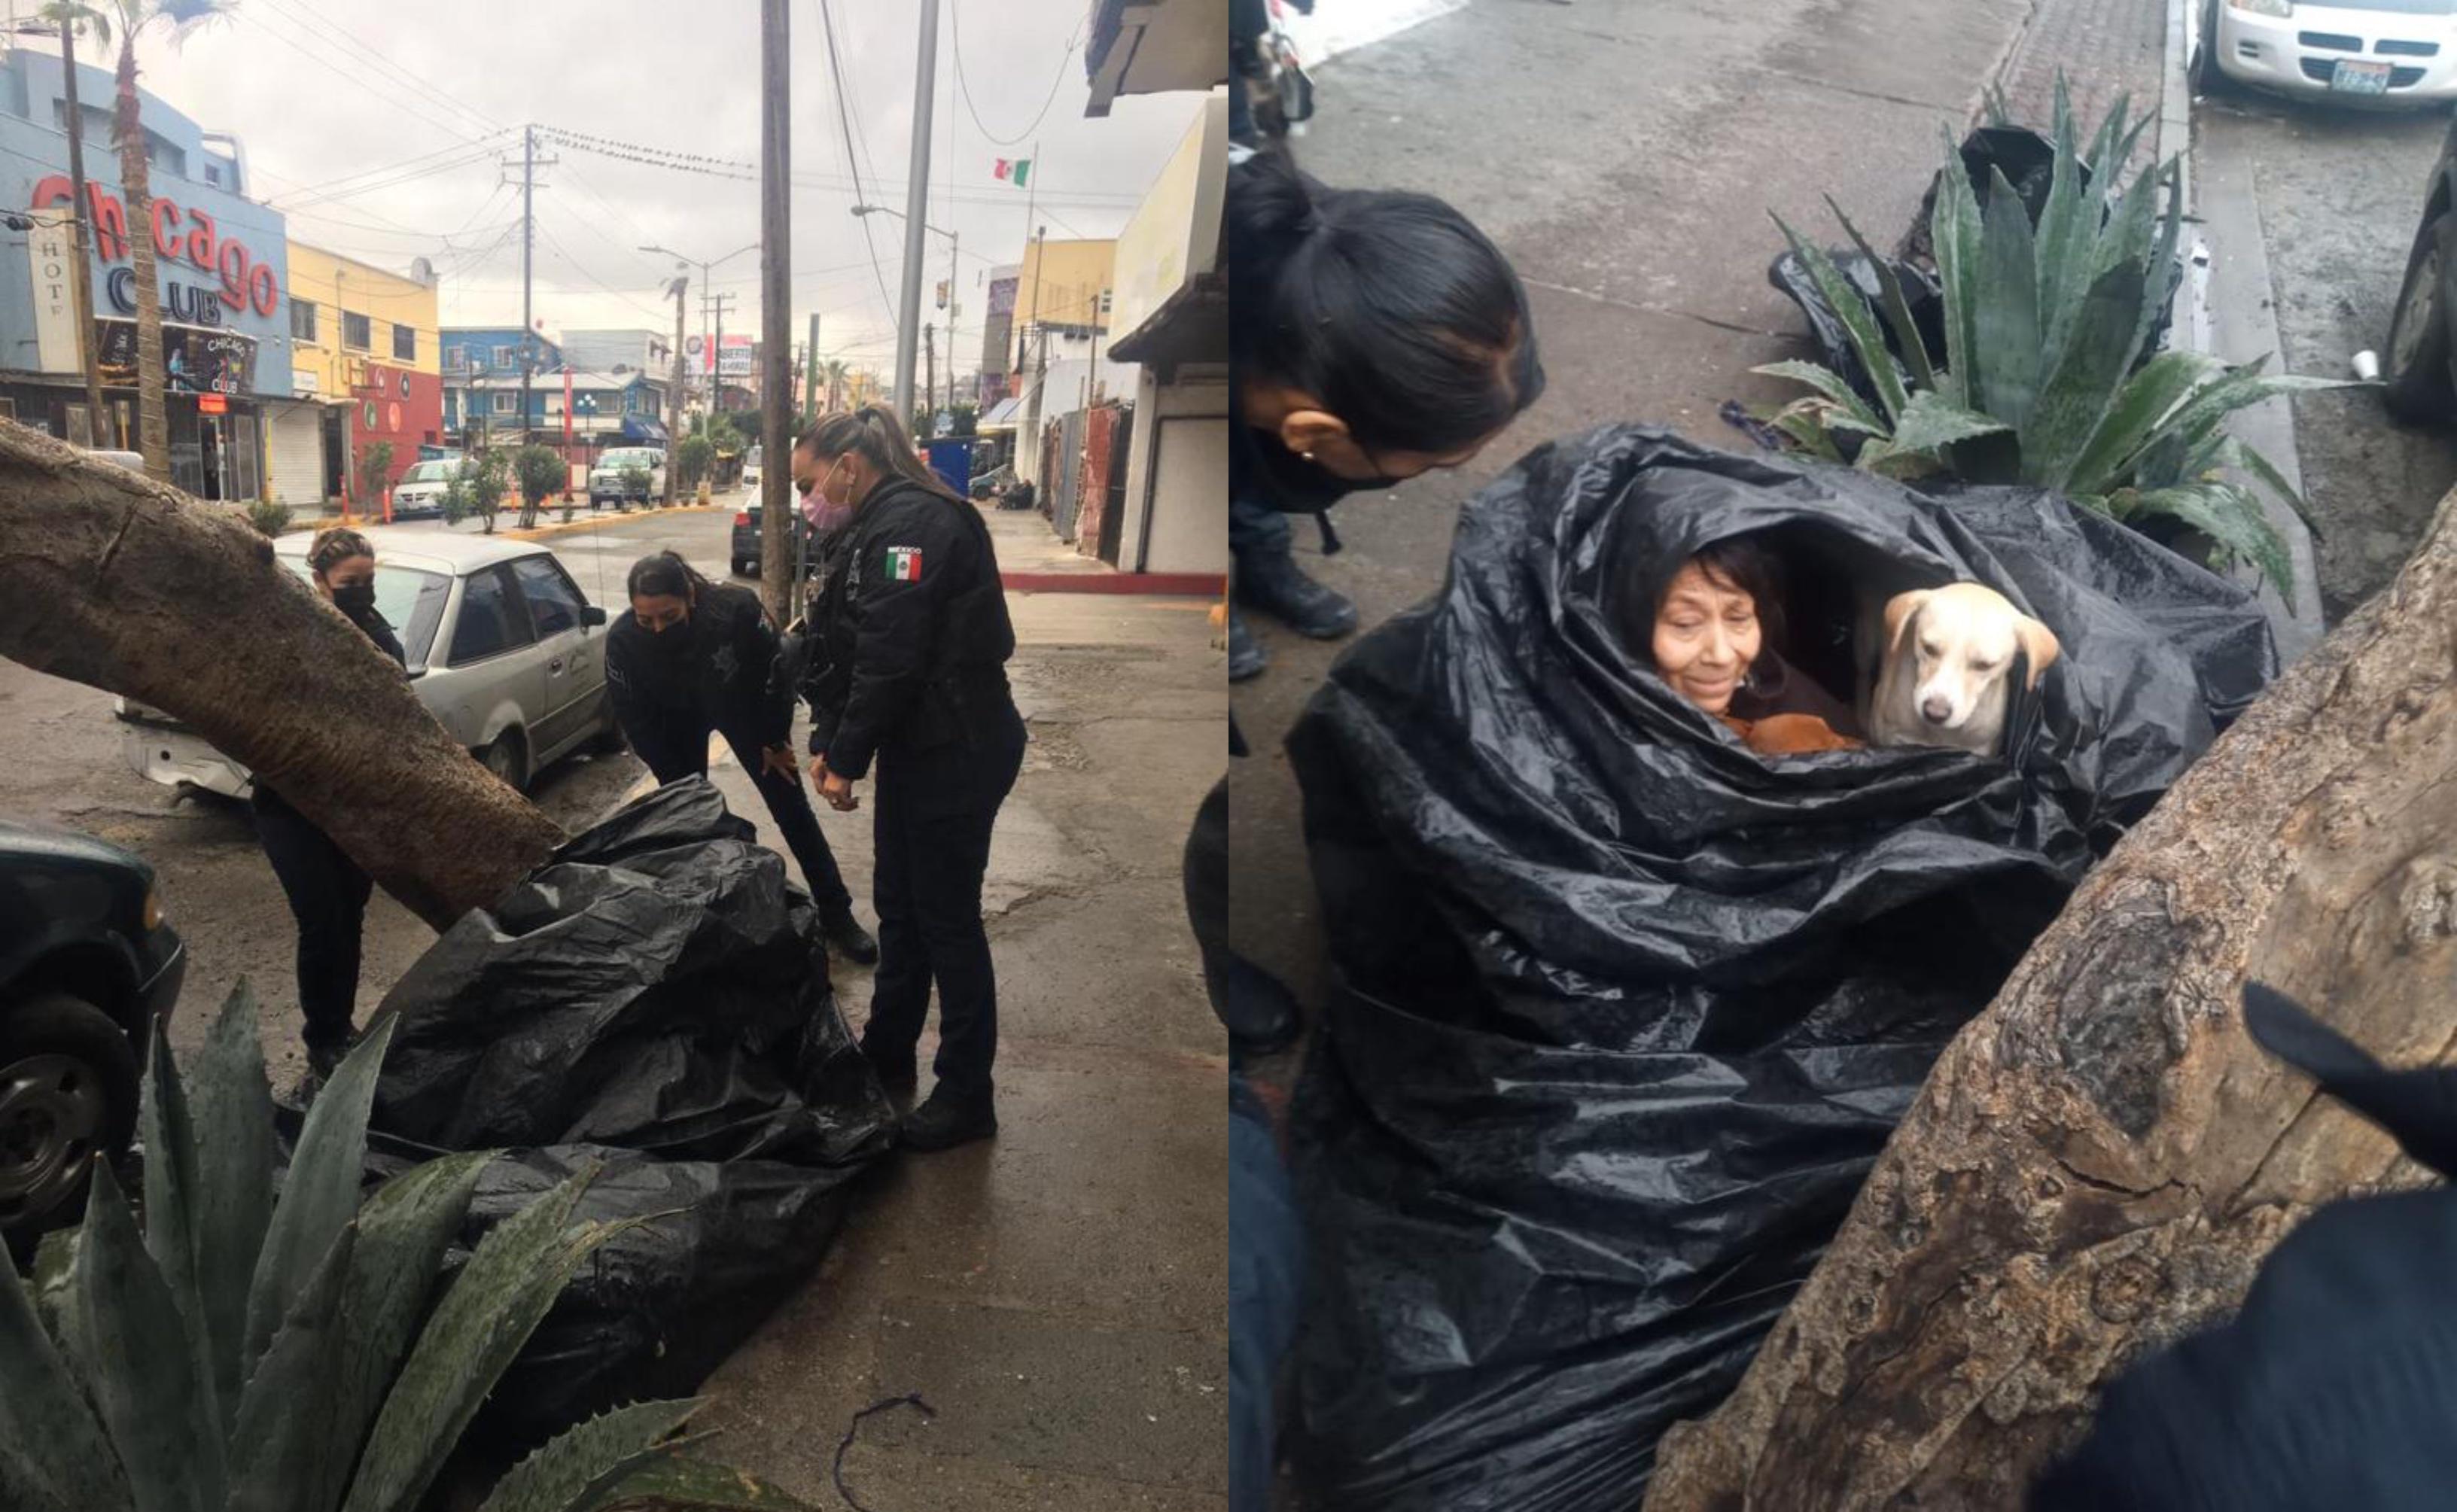 Ante onda gélida realizan operativo para resguardar a personas en situación de calle